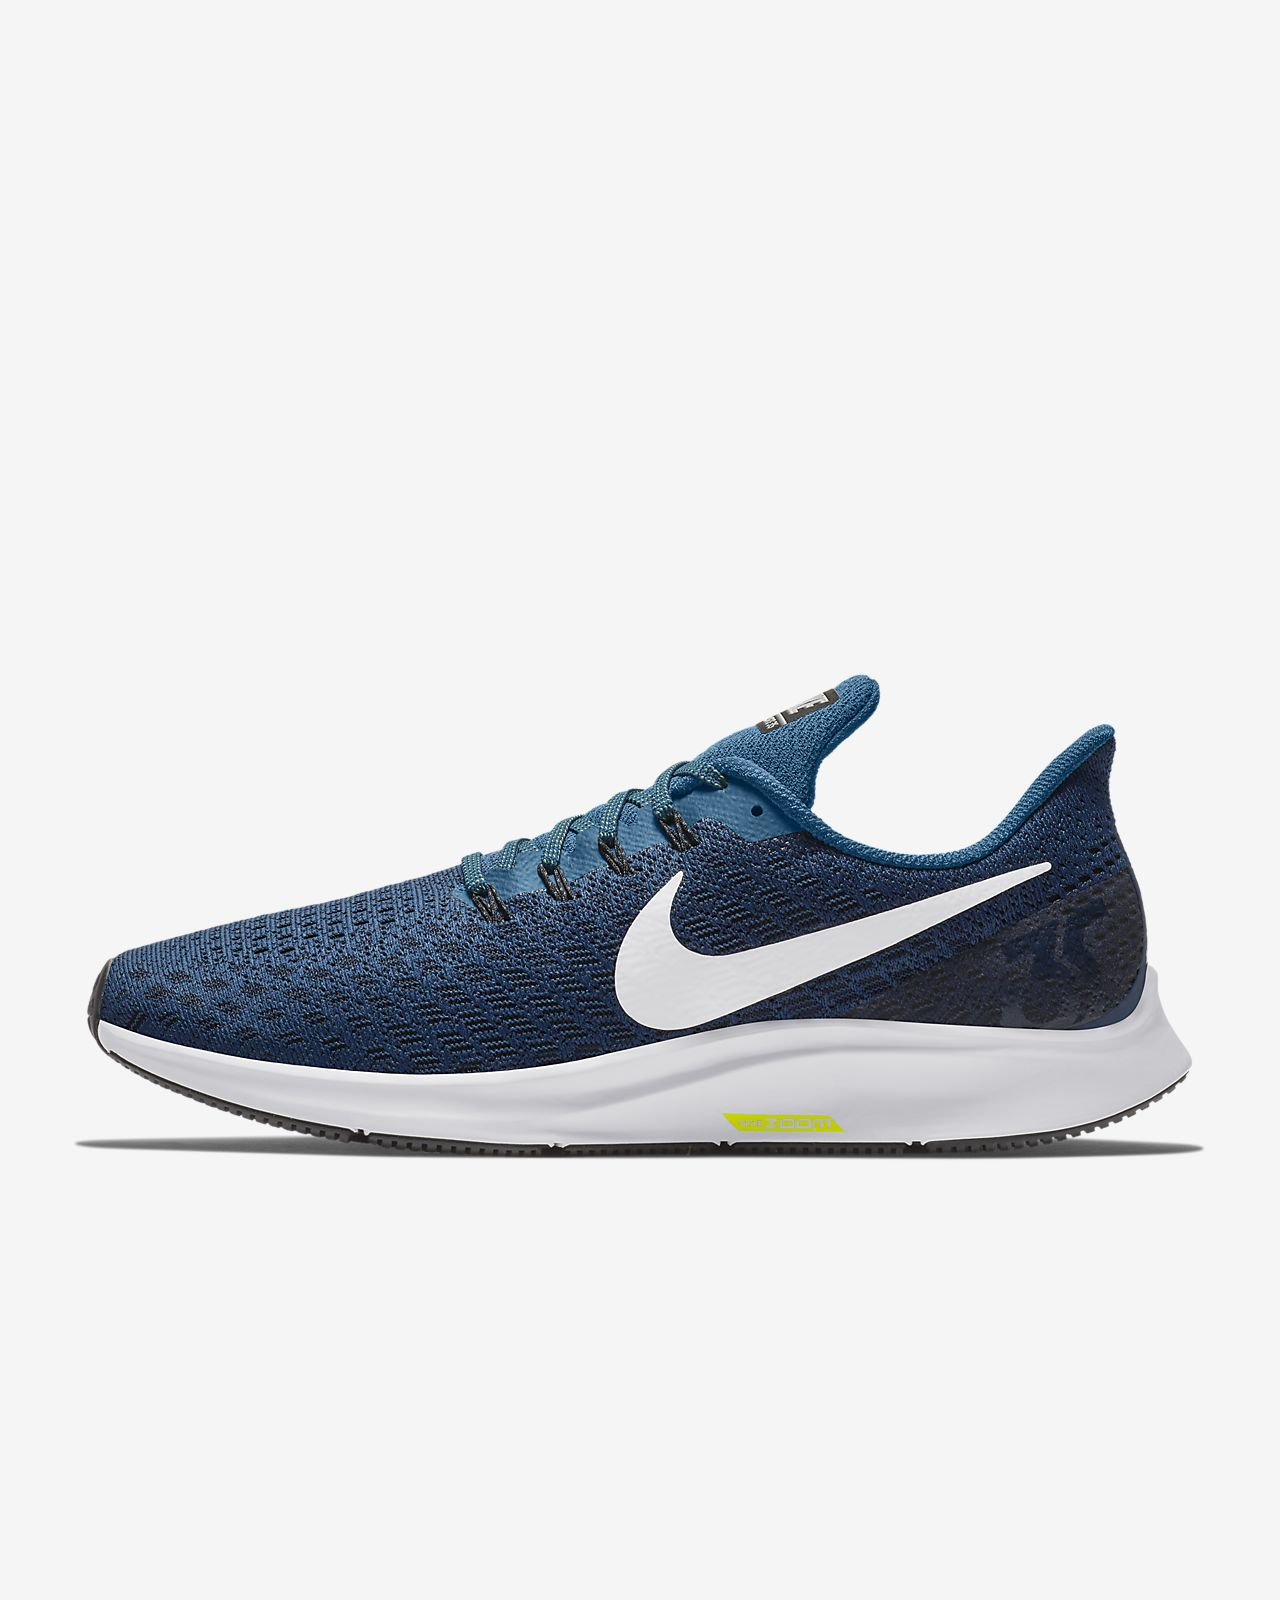 promo code abce9 d6d20 ... Chaussure de running Nike Air Zoom Pegasus 35 pour Homme